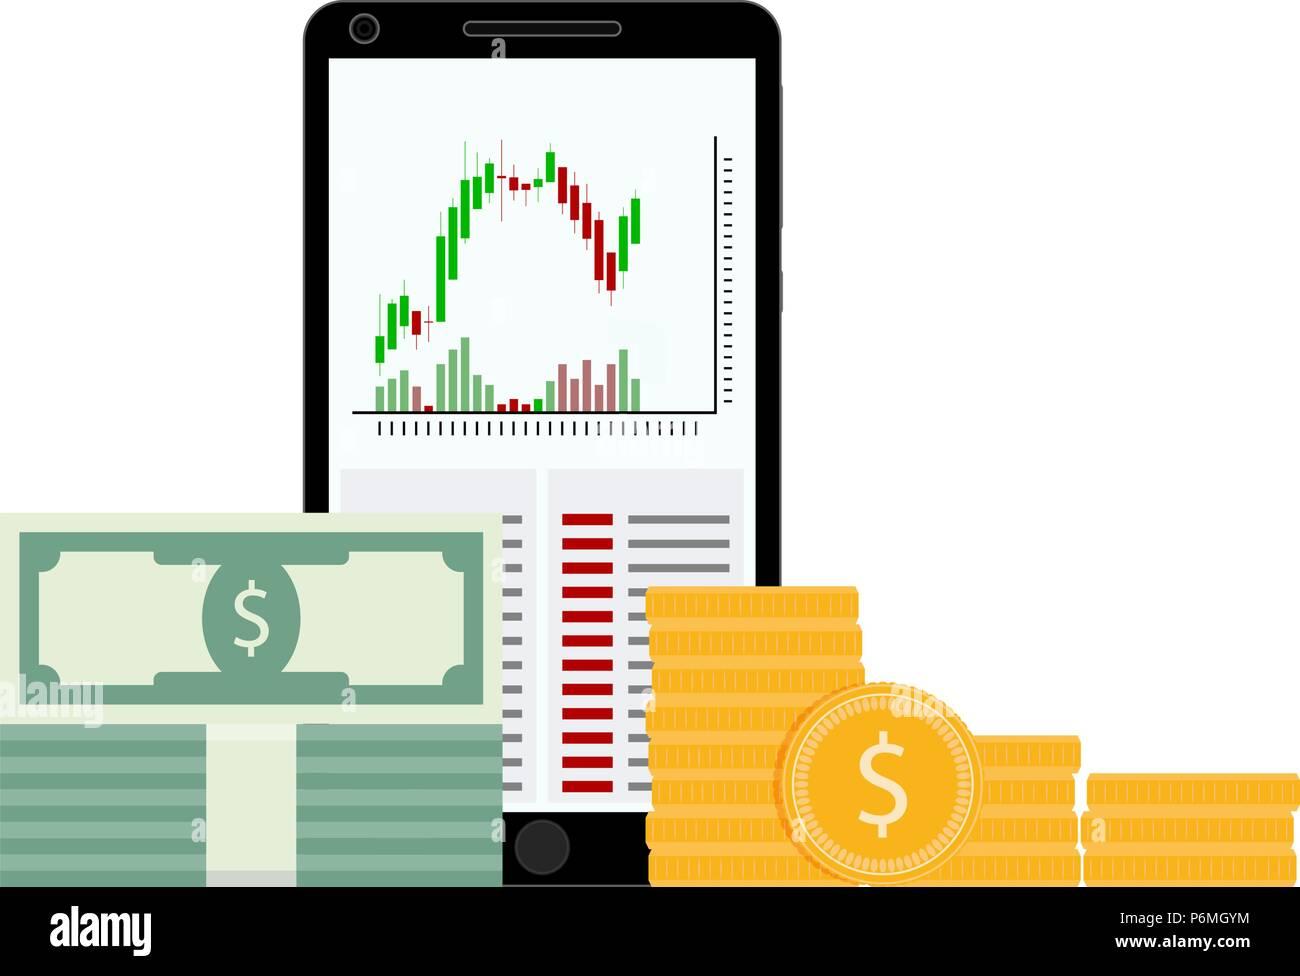 7 Best Stock Market Apps - DIY Free Mobile AppMakr